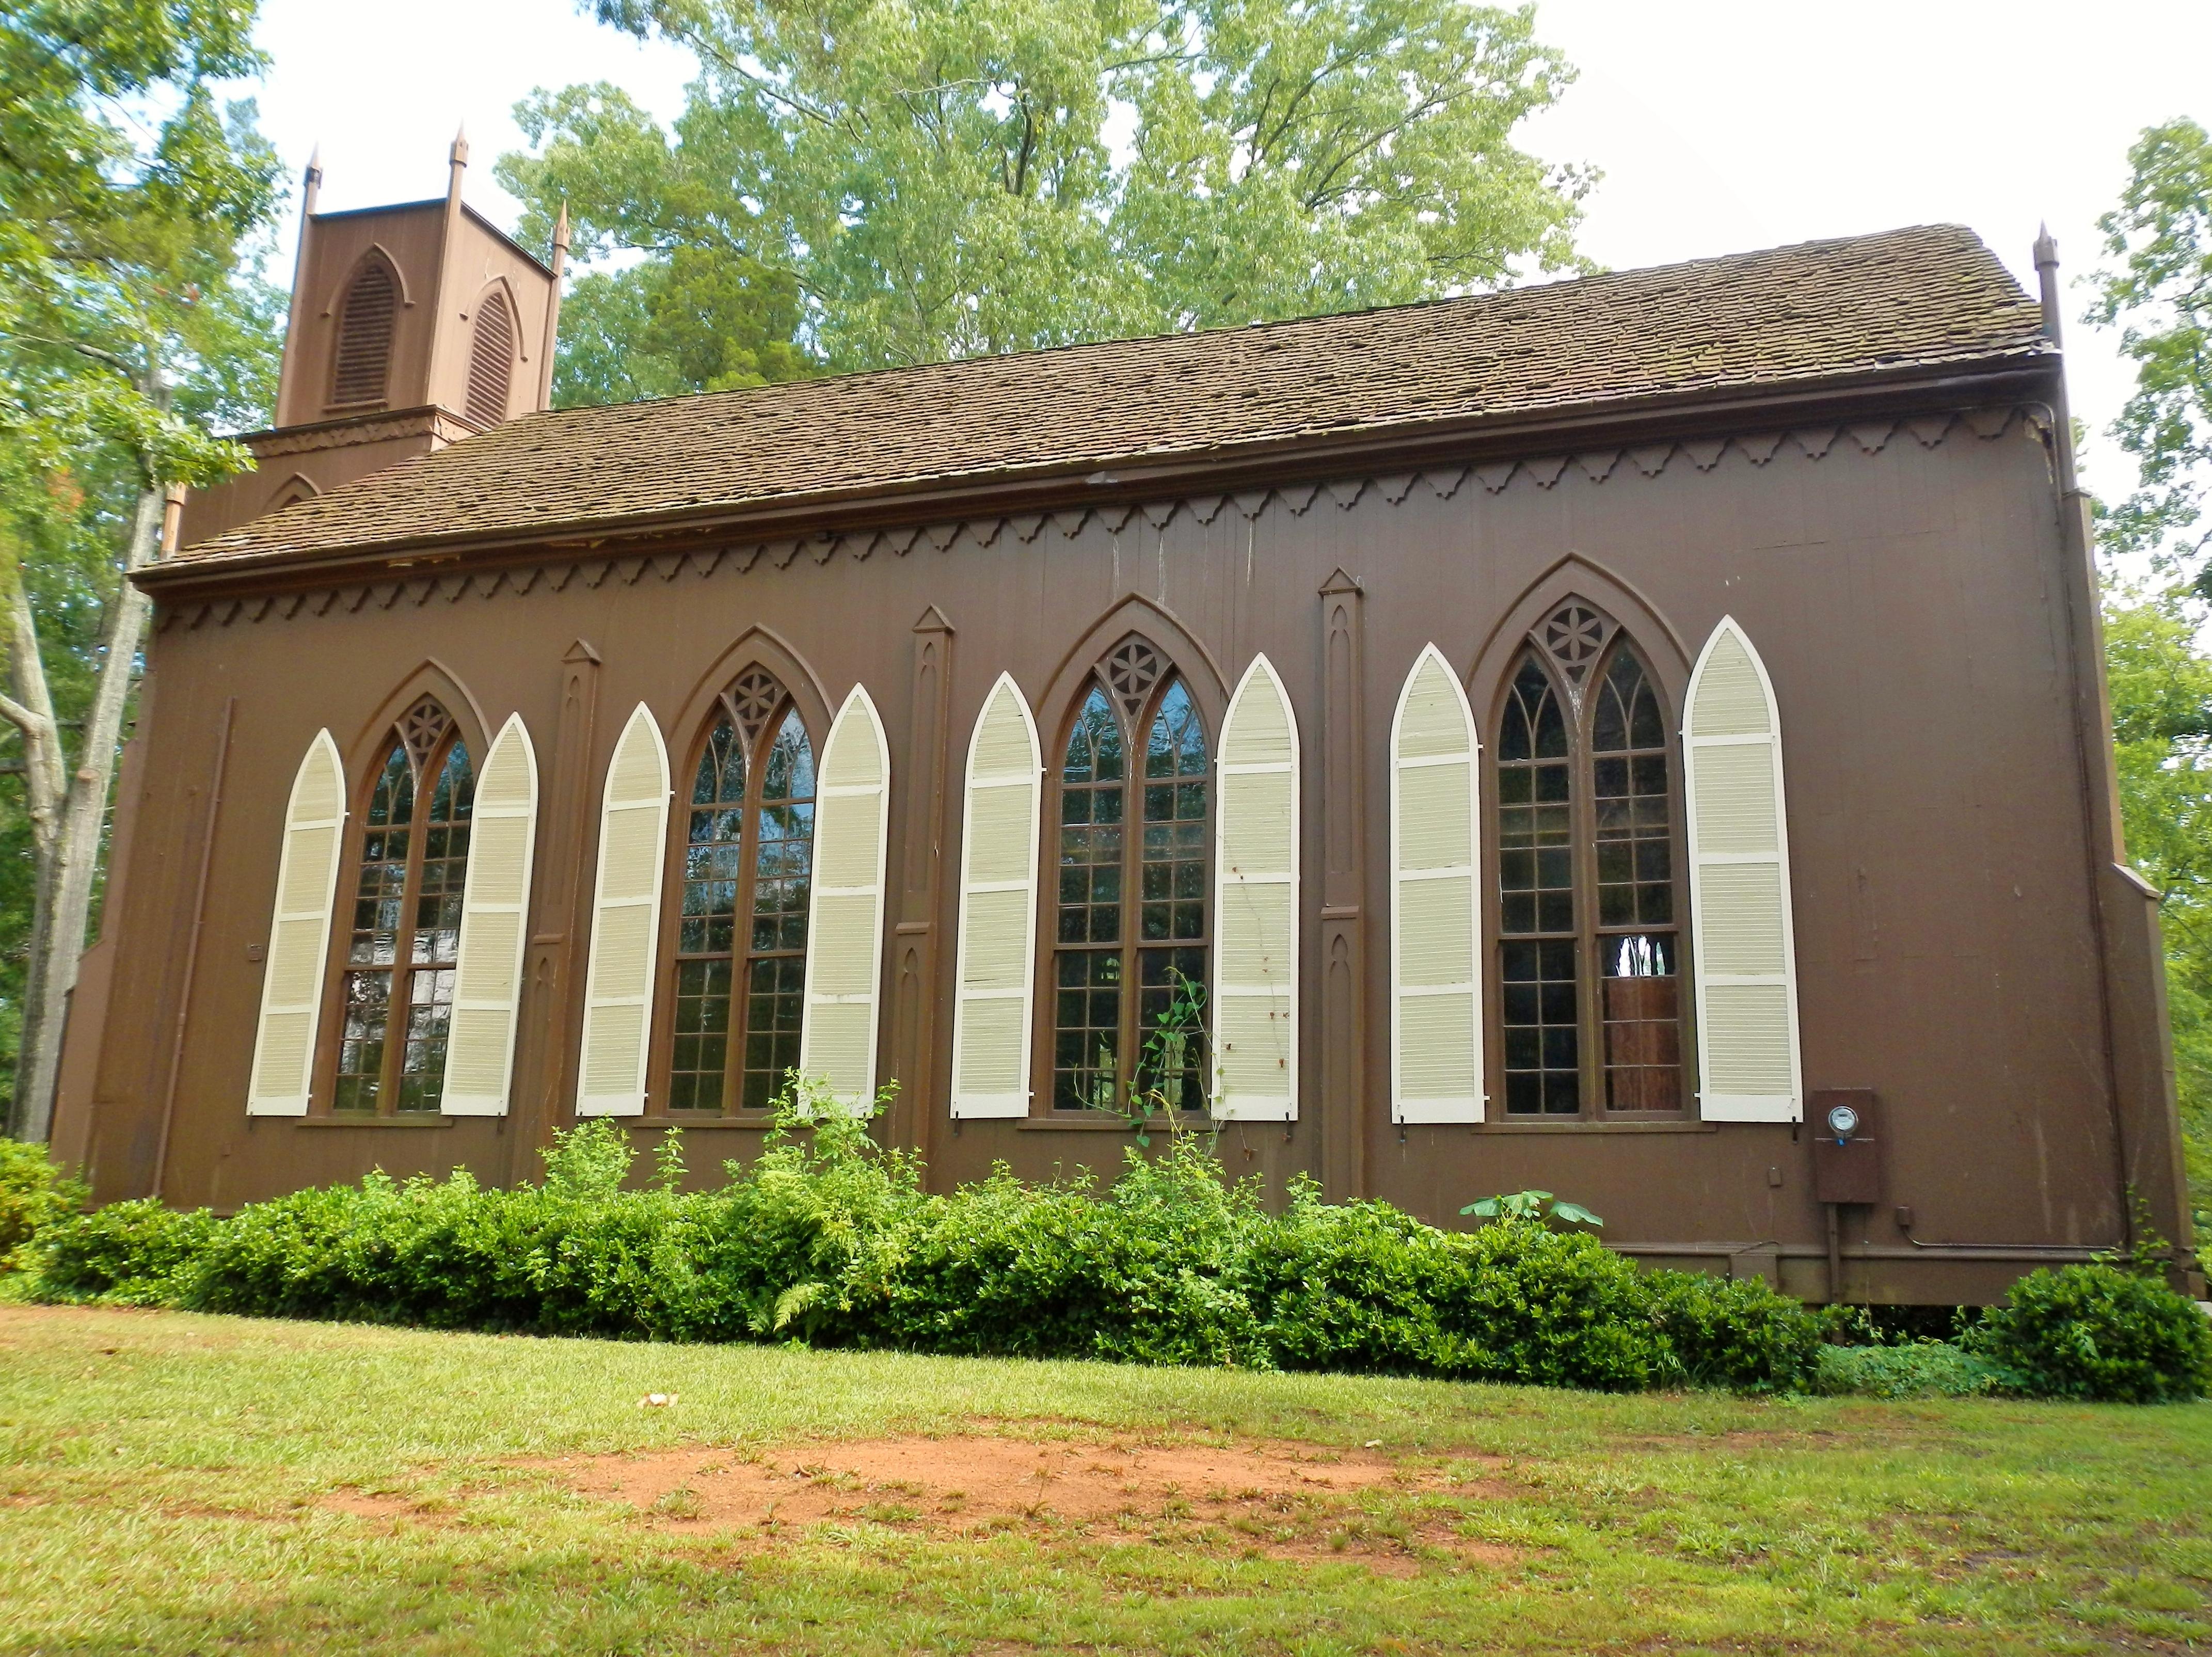 http://upload.wikimedia.org/wikipedia/commons/0/08/Zion_Episcopal_Church_(NRHP)%3B_Talbotton,_GA.JPG